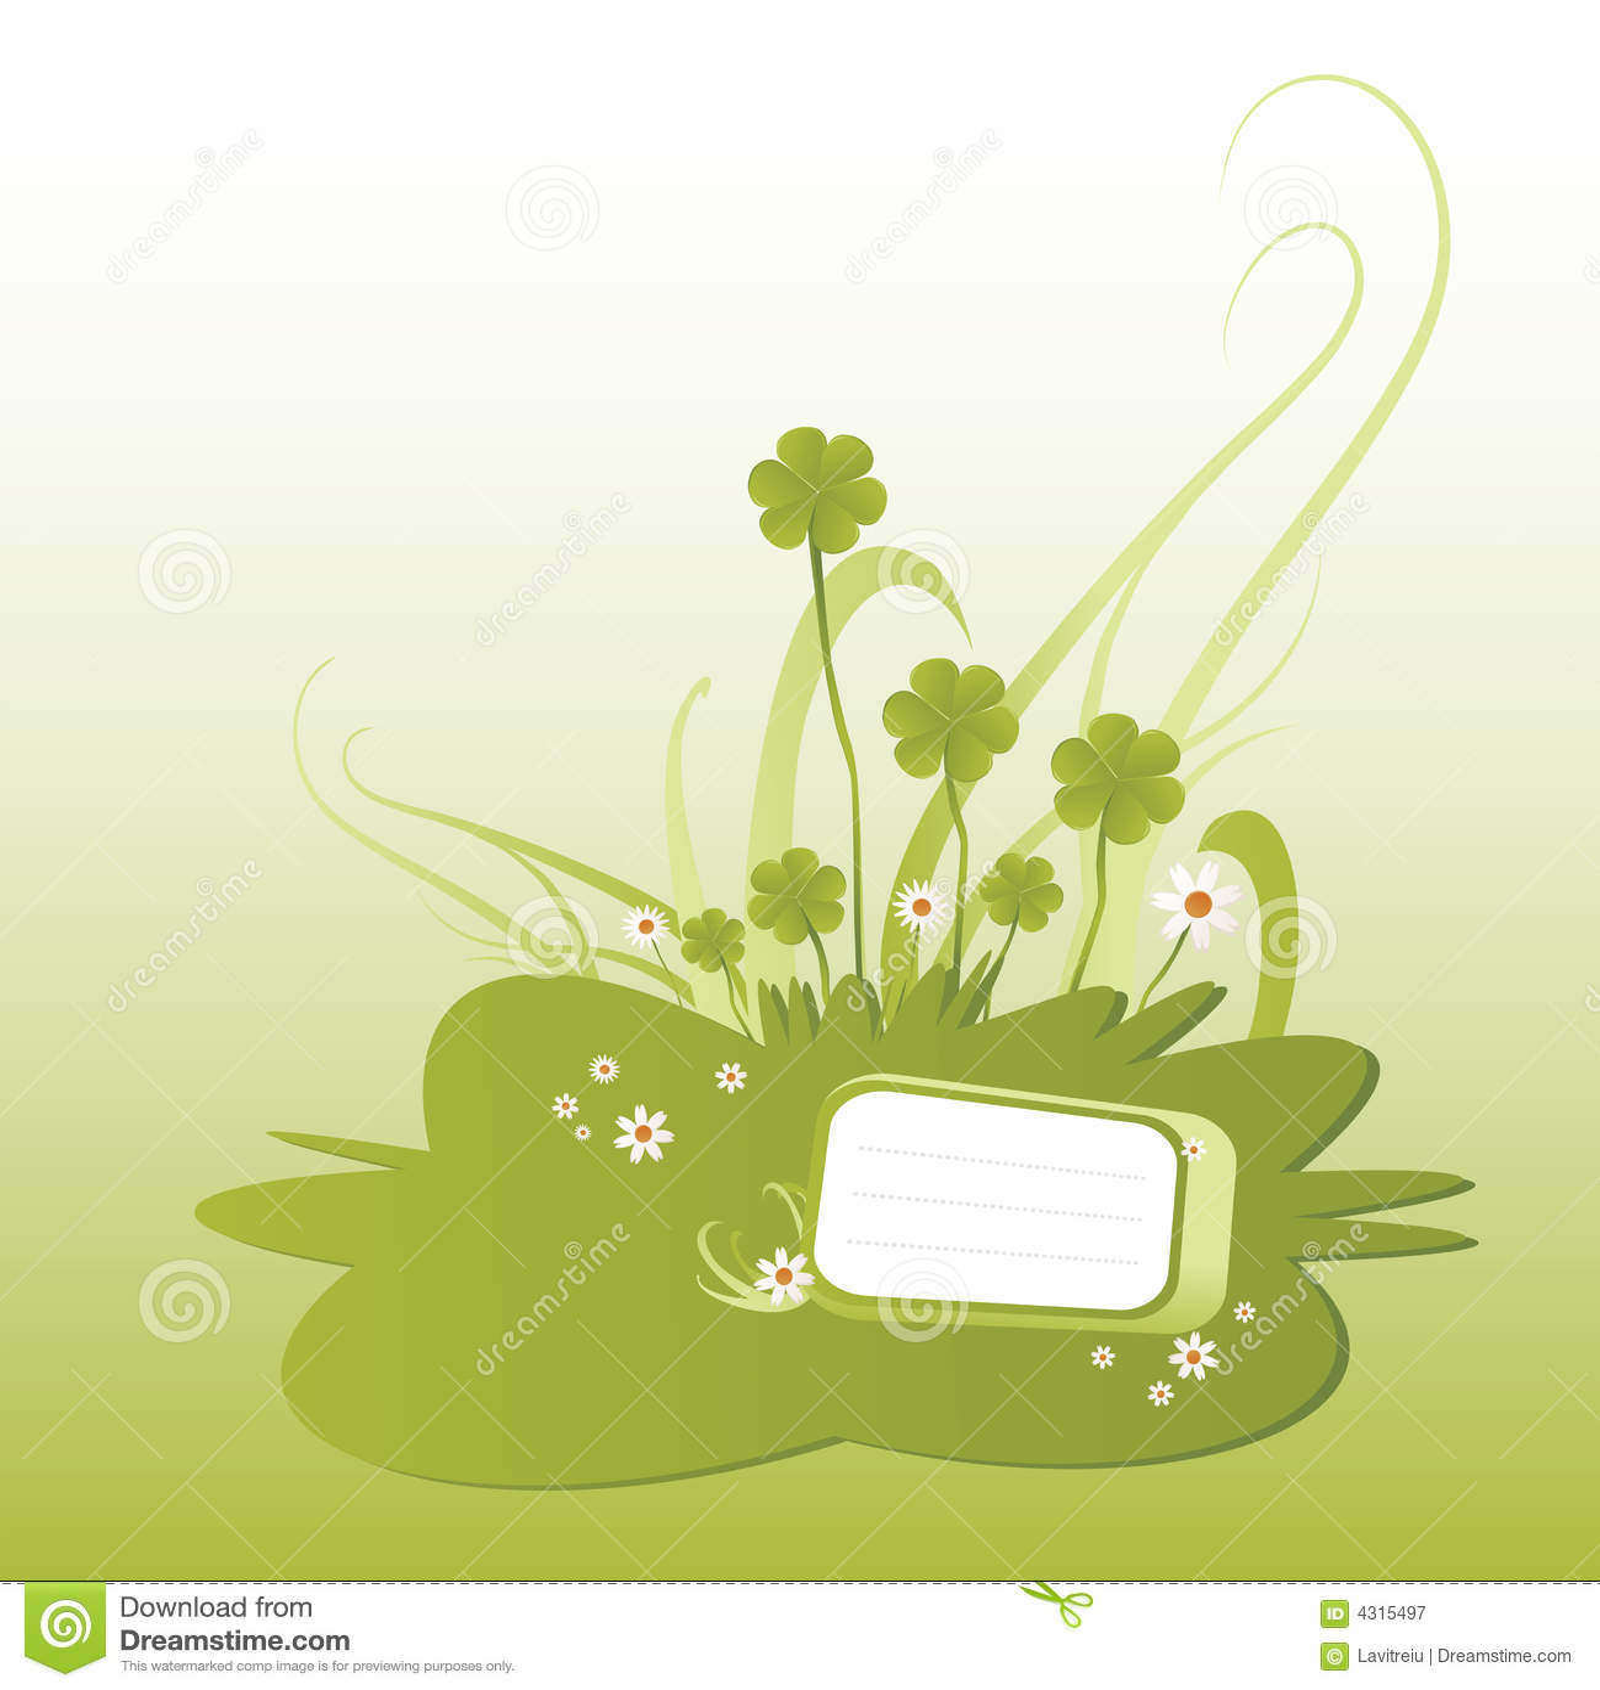 Green shamrock illustration